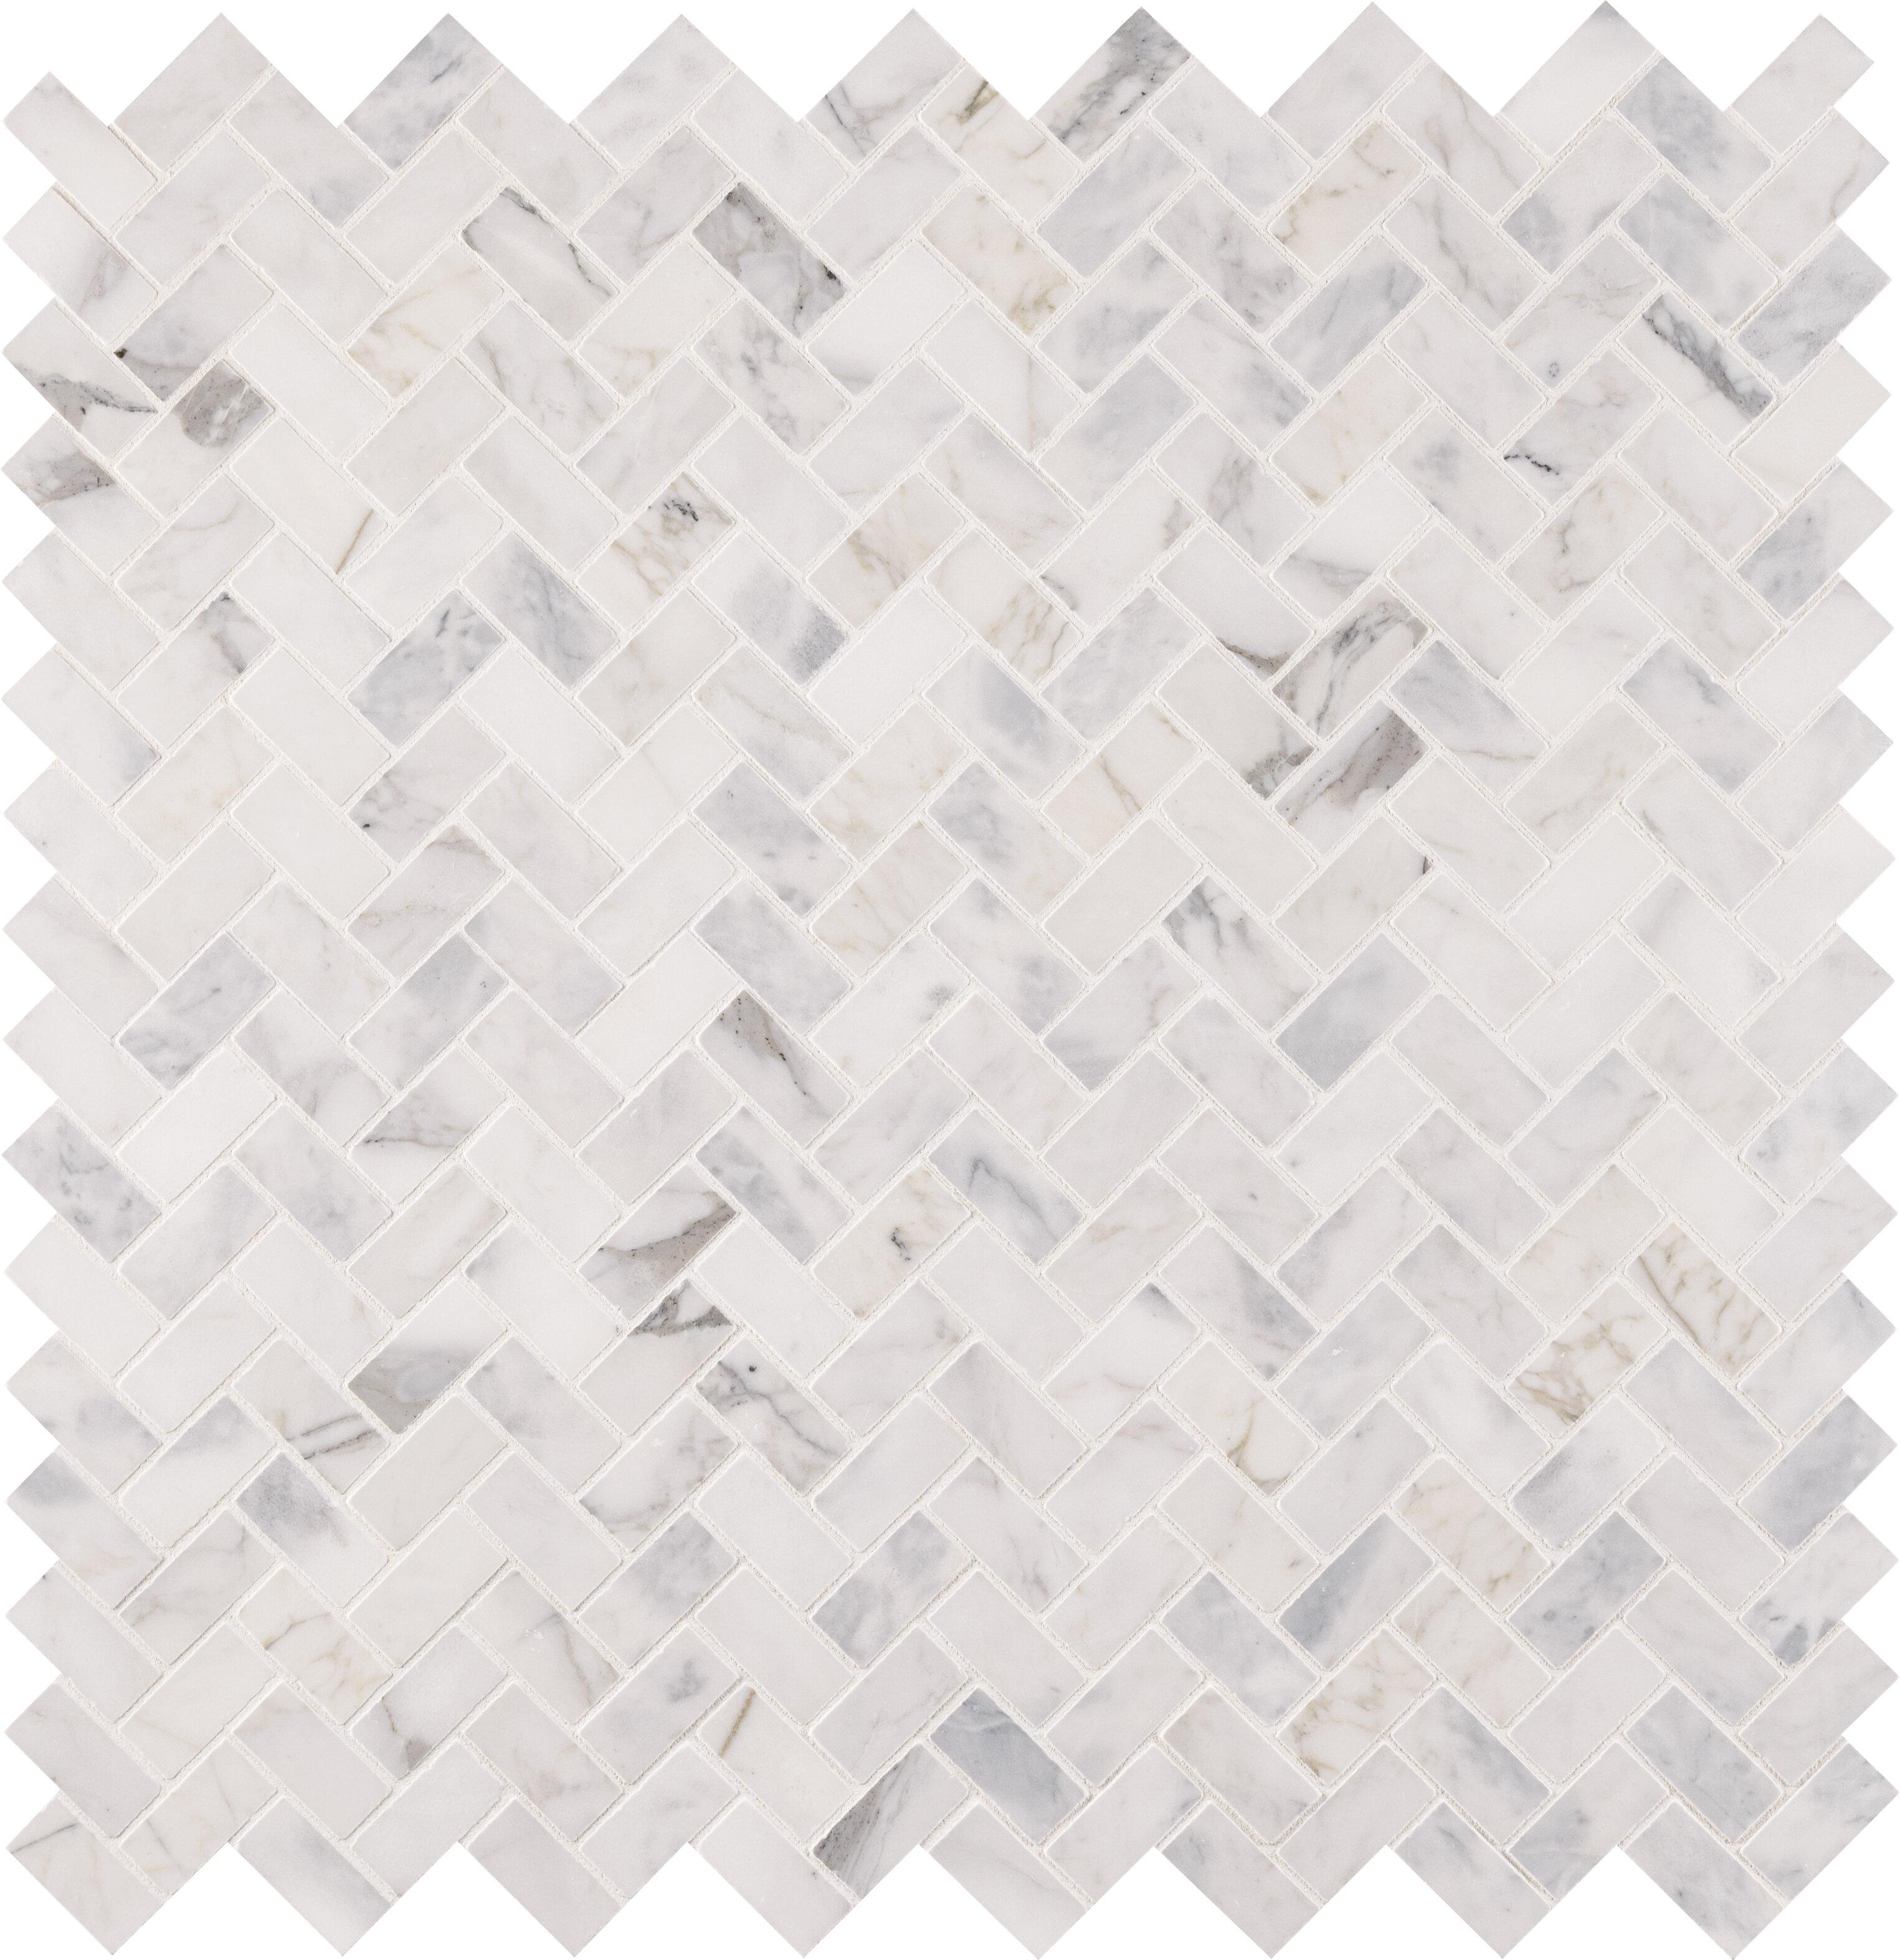 Msi Calacatta Cressa 1 X 2 Marble Herringbone Mosaic Wall Floor Tile Reviews Wayfair